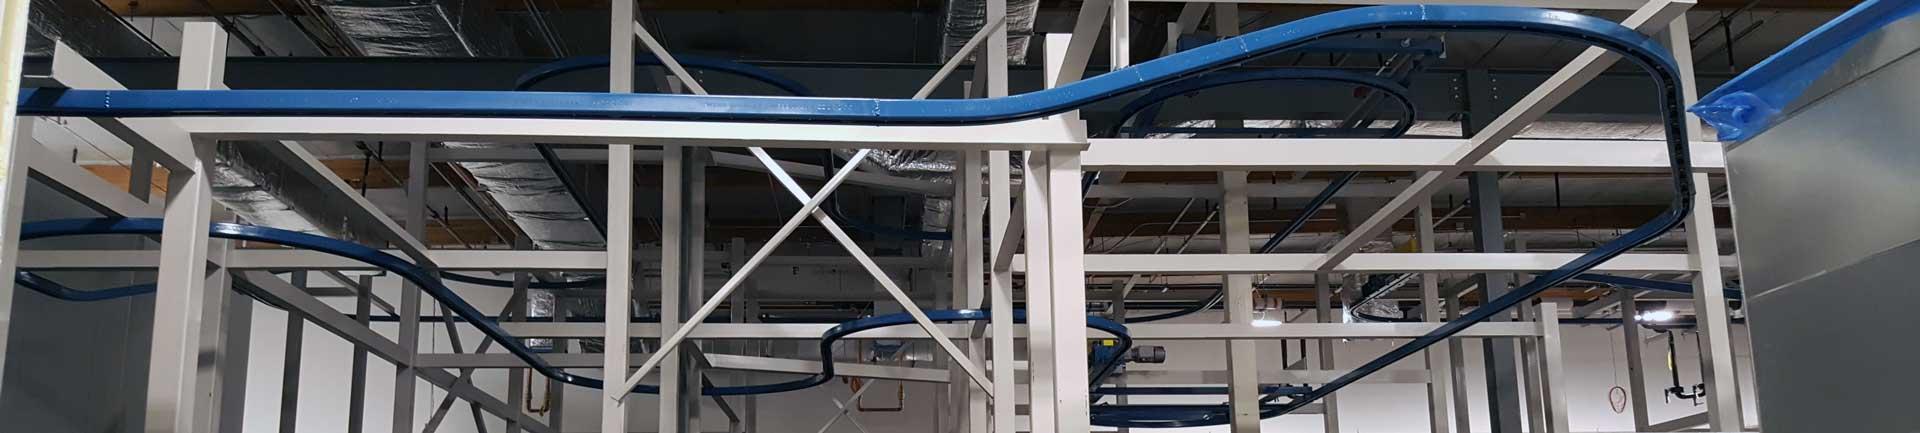 Unibilt Conveyors